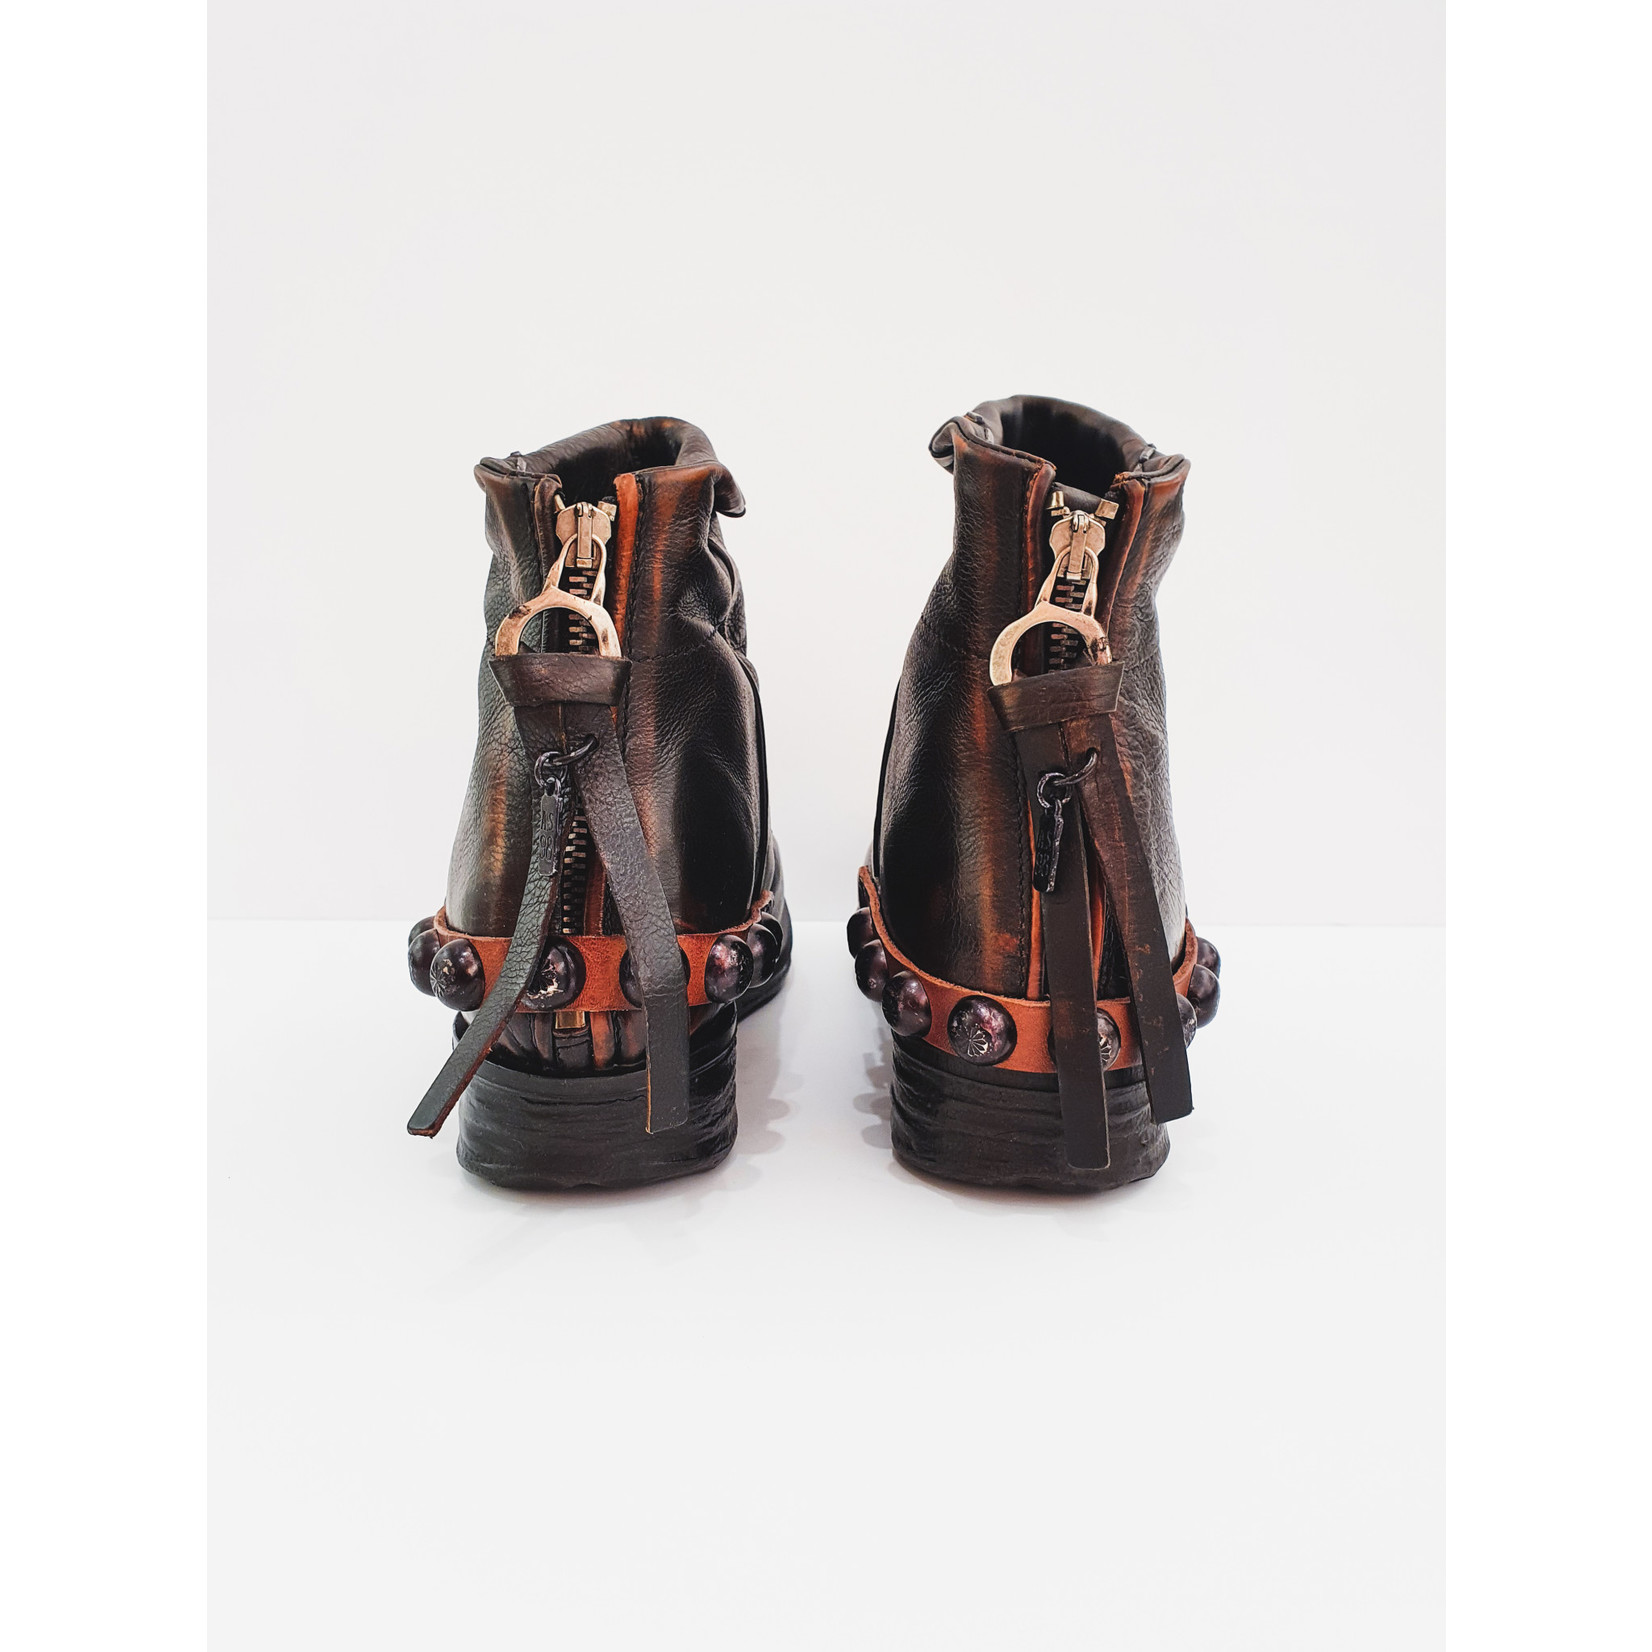 Rusty Dusty boots